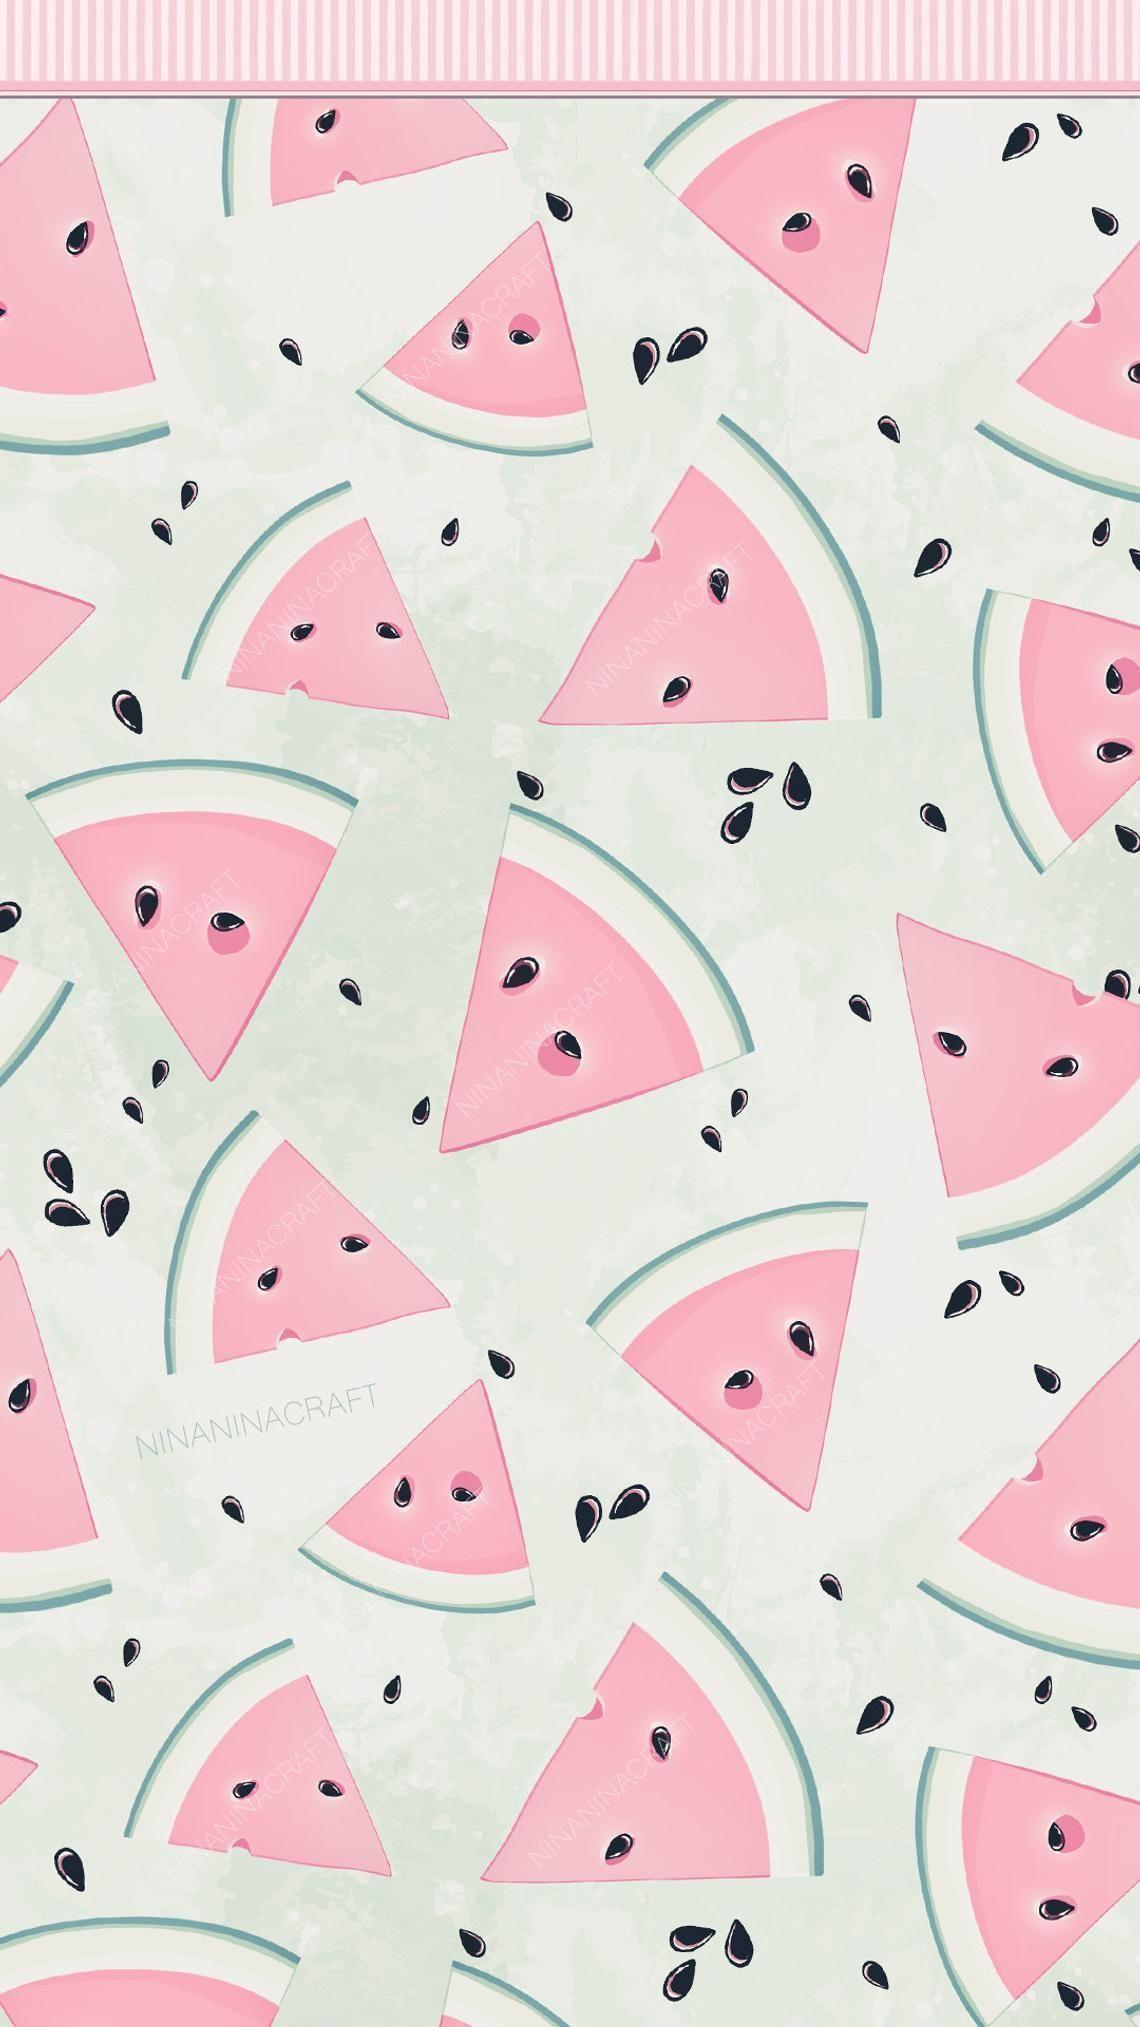 Pastel Cute Watermelon Clip Art Watermelon Digital Papers Summer Fruit Seamless Patterns Wallpaper Iphone Cute Watermelon Wallpaper Cute Watermelon